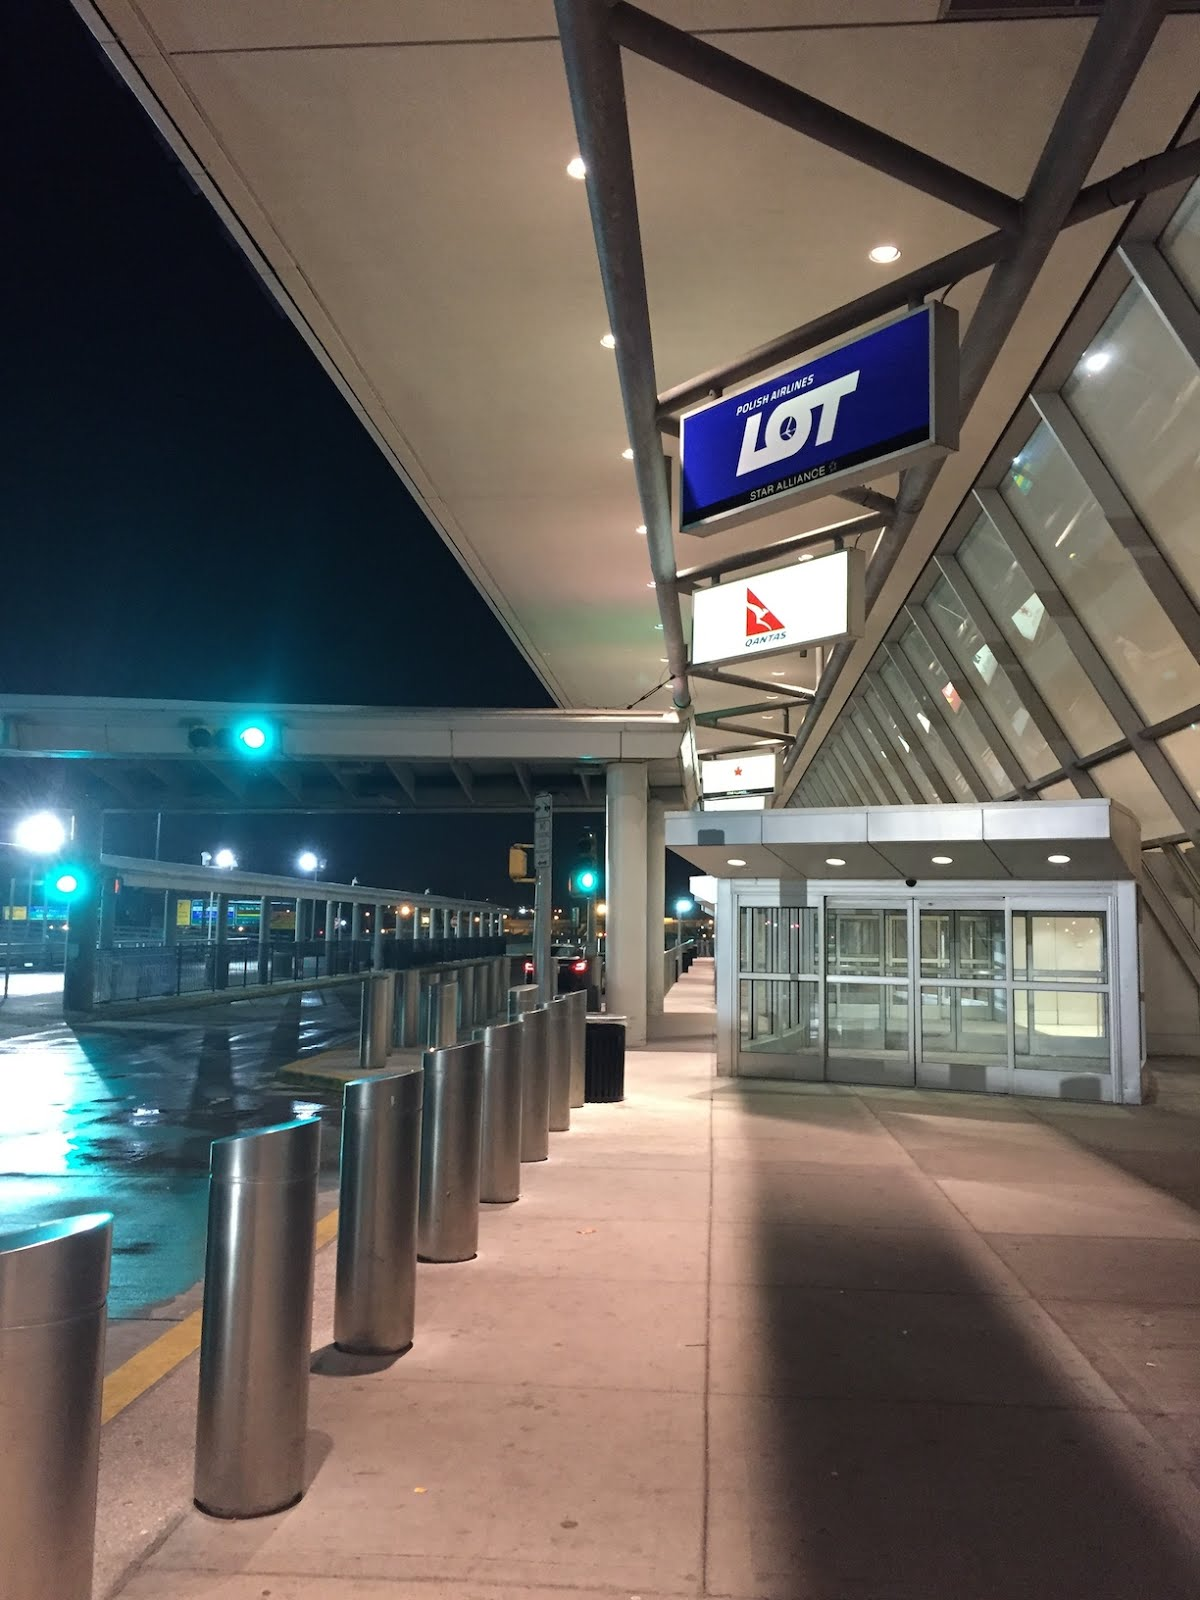 Aeroporto Waw : Review: lot polish airlines economy jfk waw svo traveler trials